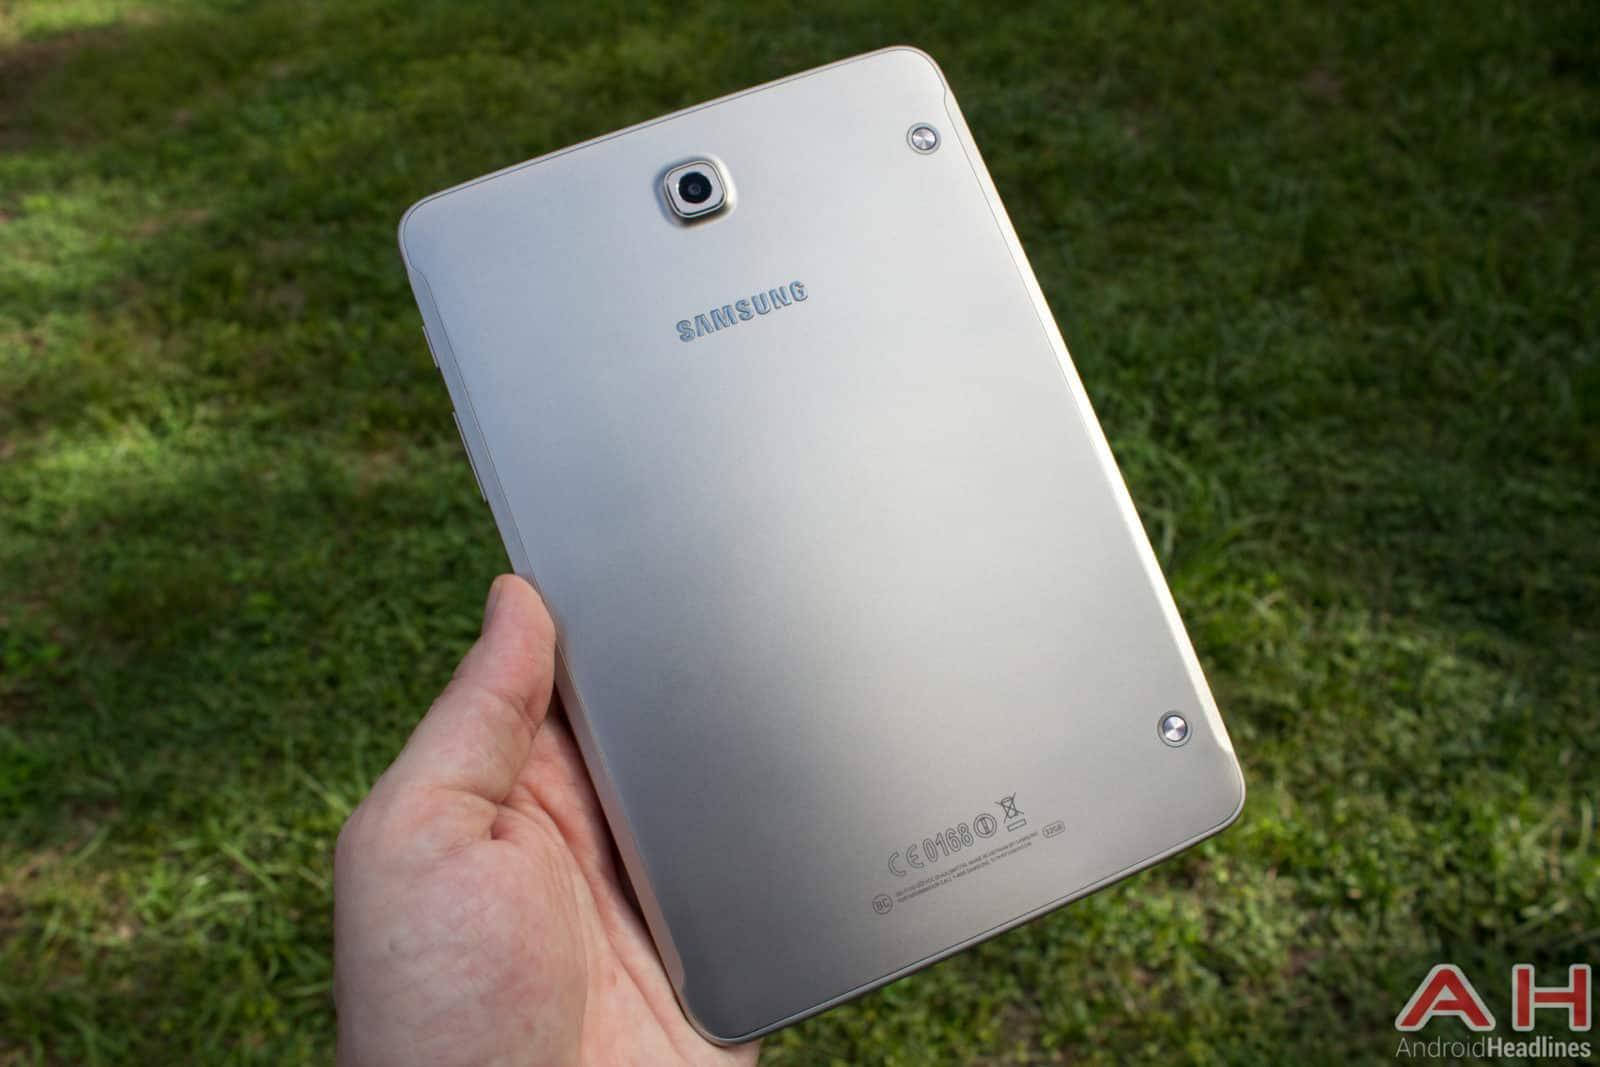 Samsung-Galaxy-Tab-S2-AH-02